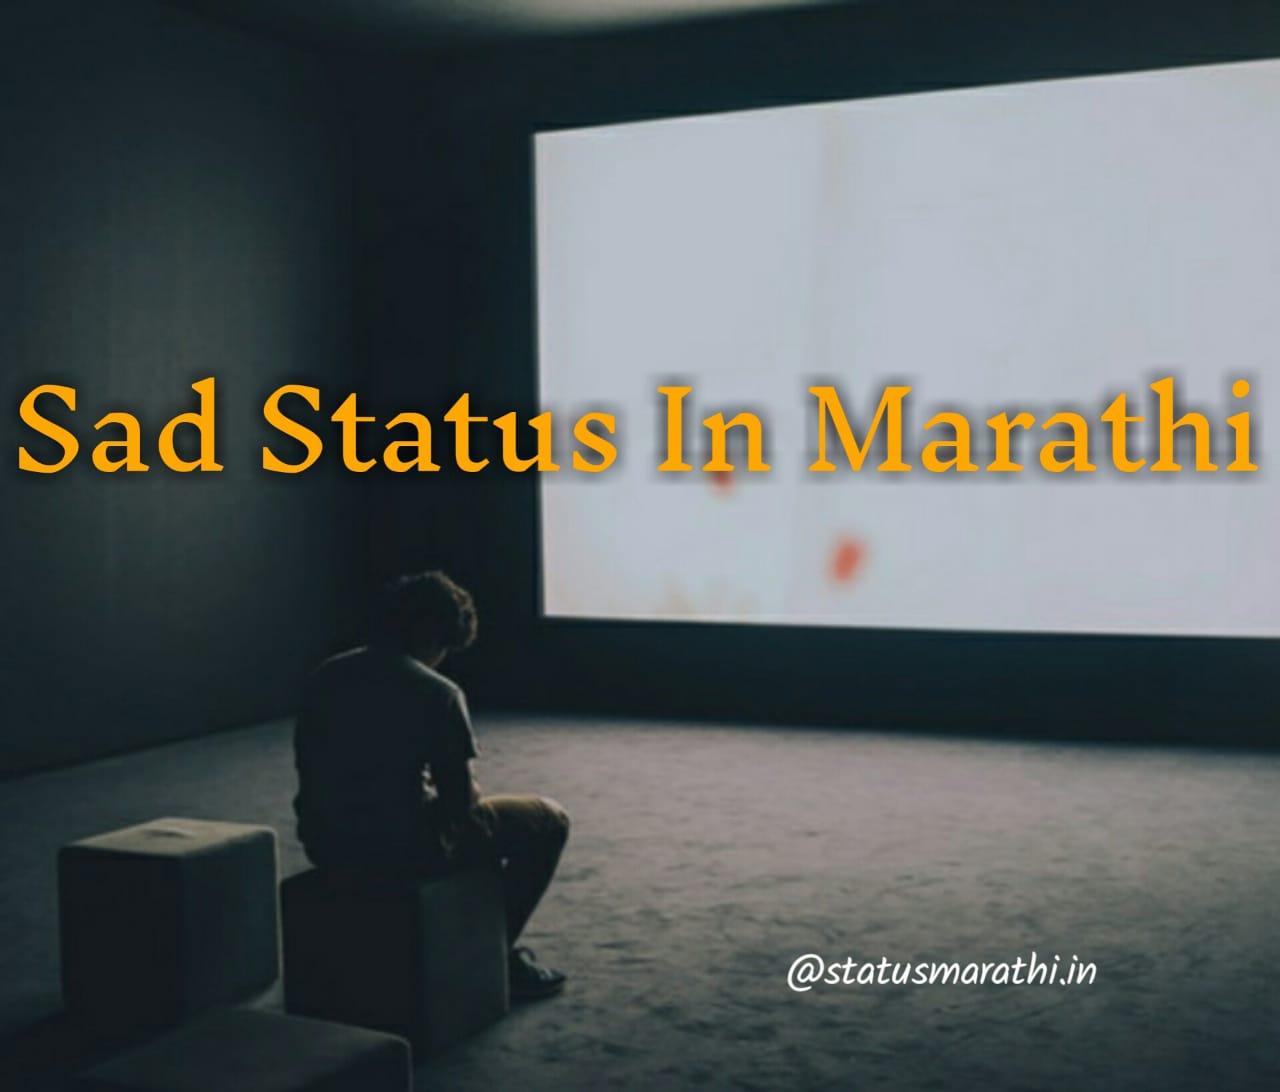 Sad Status In Marathi For Whatsapp And Facebook